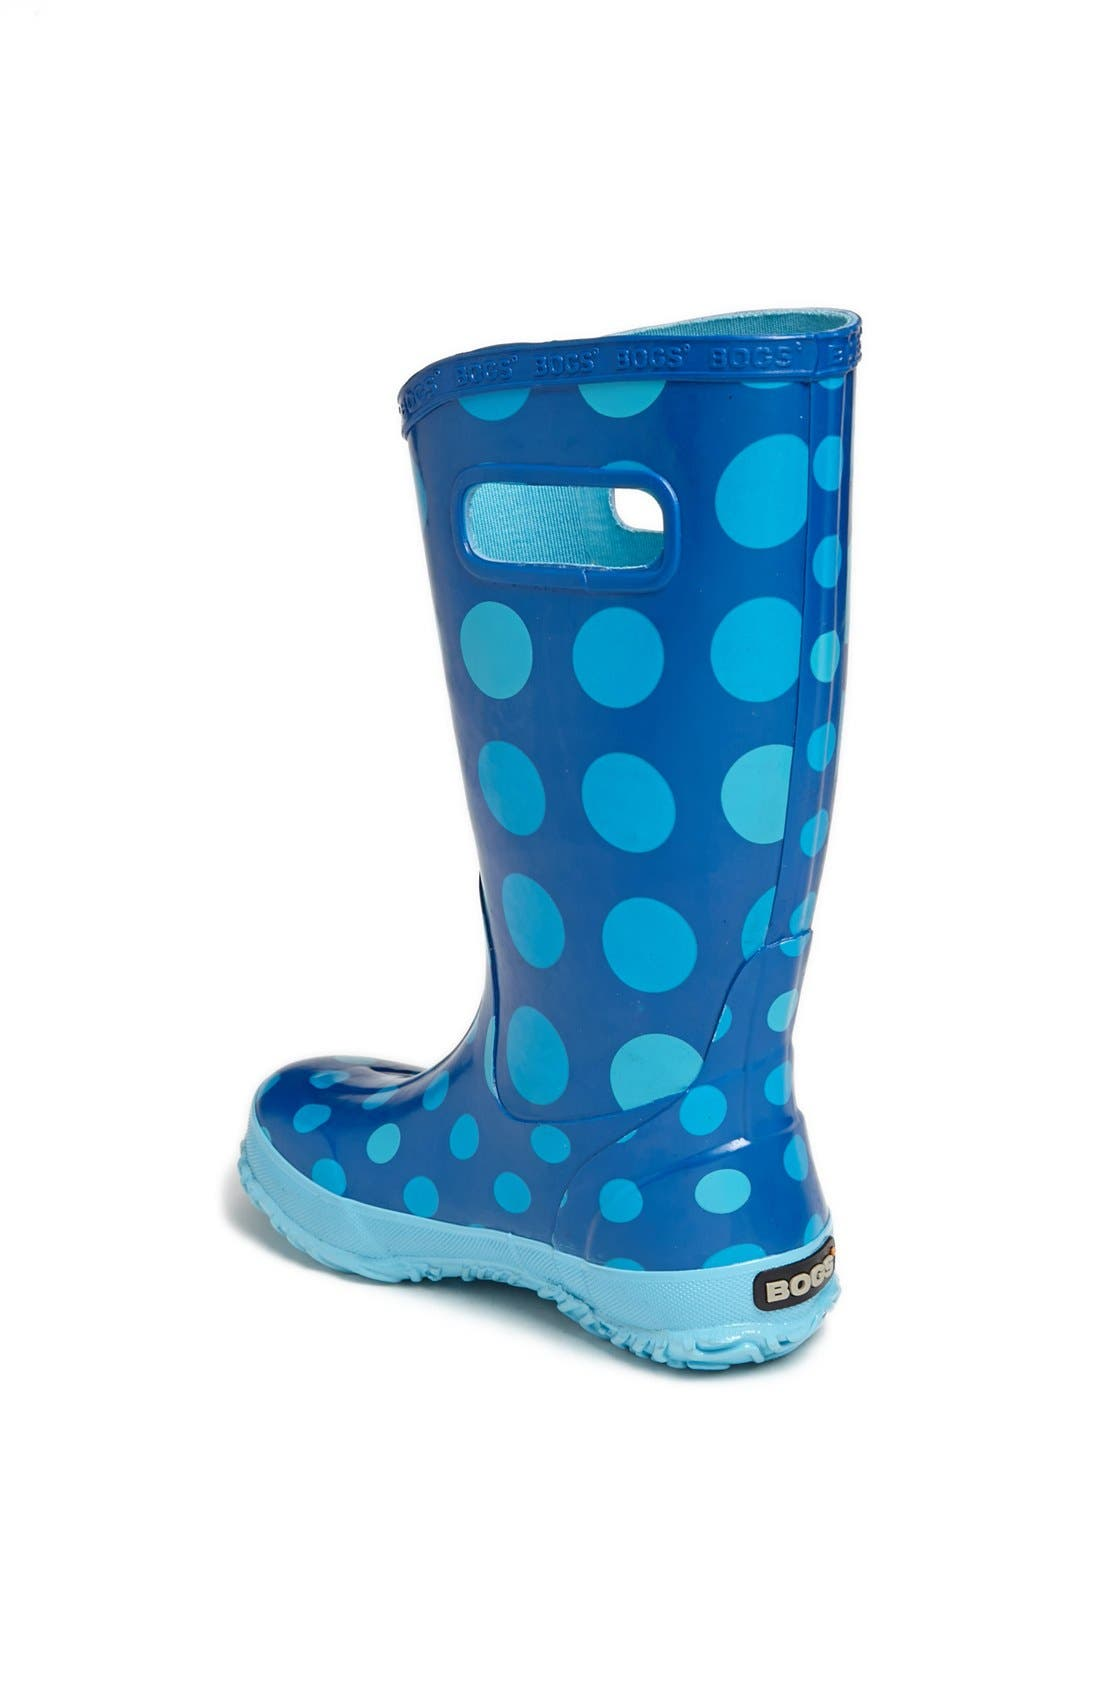 Alternate Image 2  - Bogs 'Dots' Rain Boot (Walker, Toddler, Little Kid & Big Kid)